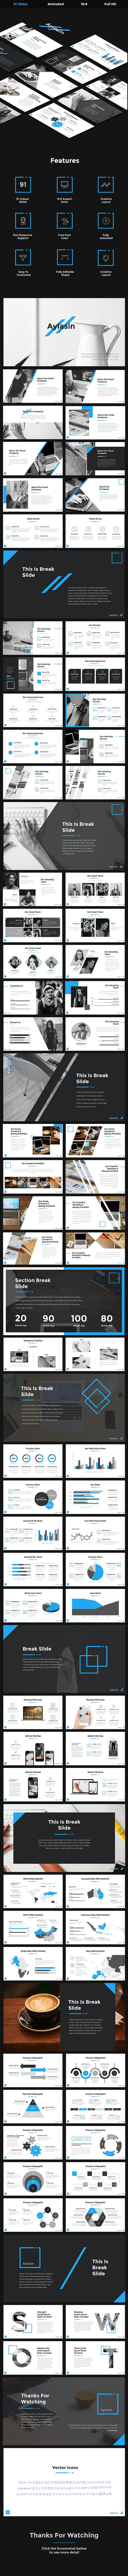 Aylasin - Creative Powerpoint Template - Creative PowerPoint Templates